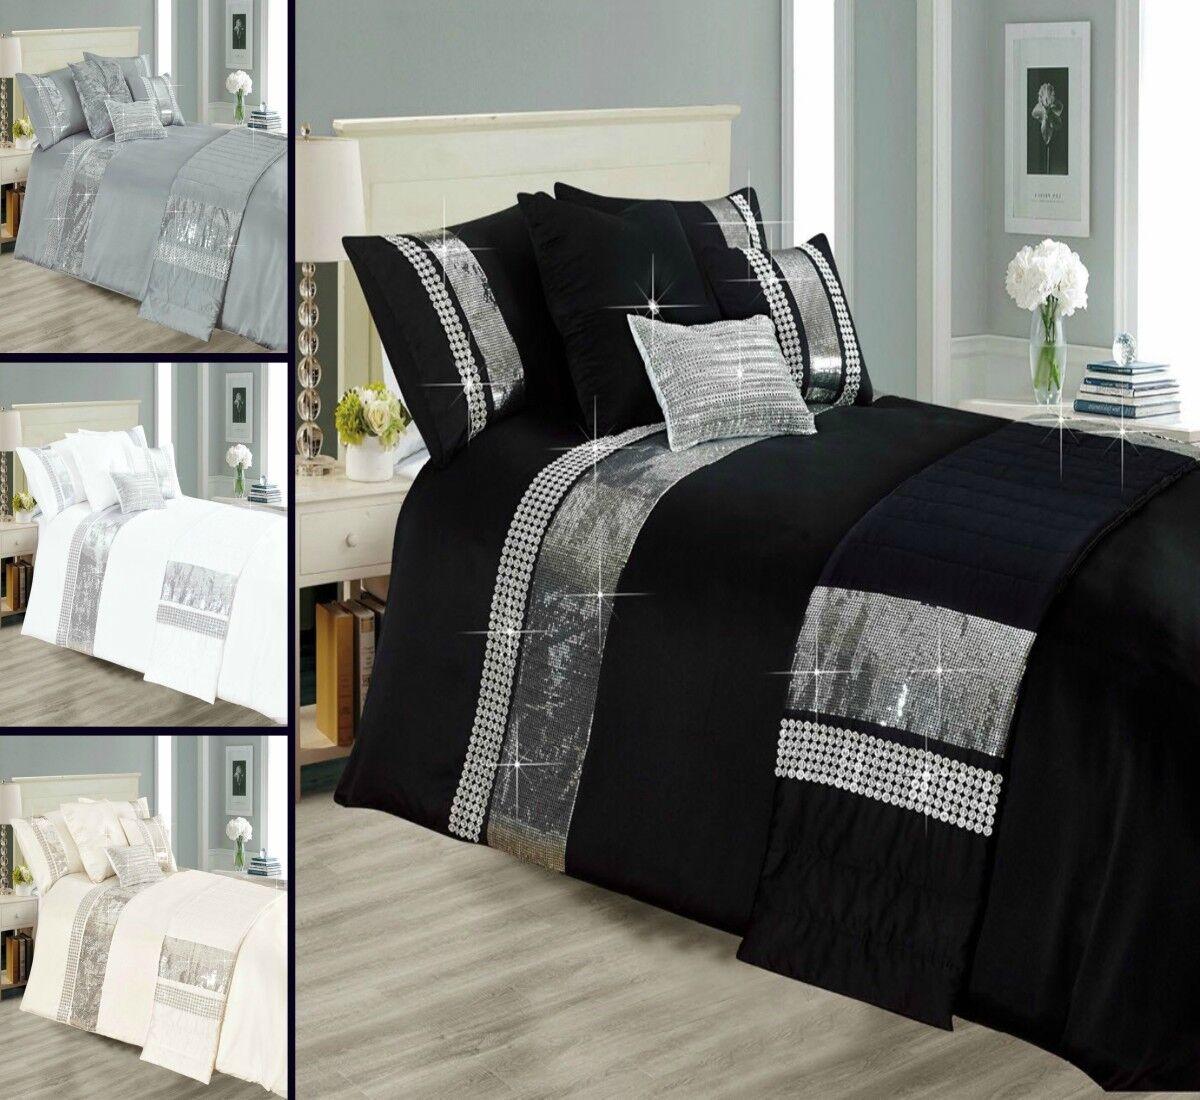 Sequence Style Star Lite 3 Piece Bedding Set 1 Duvet Quilt Cover 2 Pillow Cases